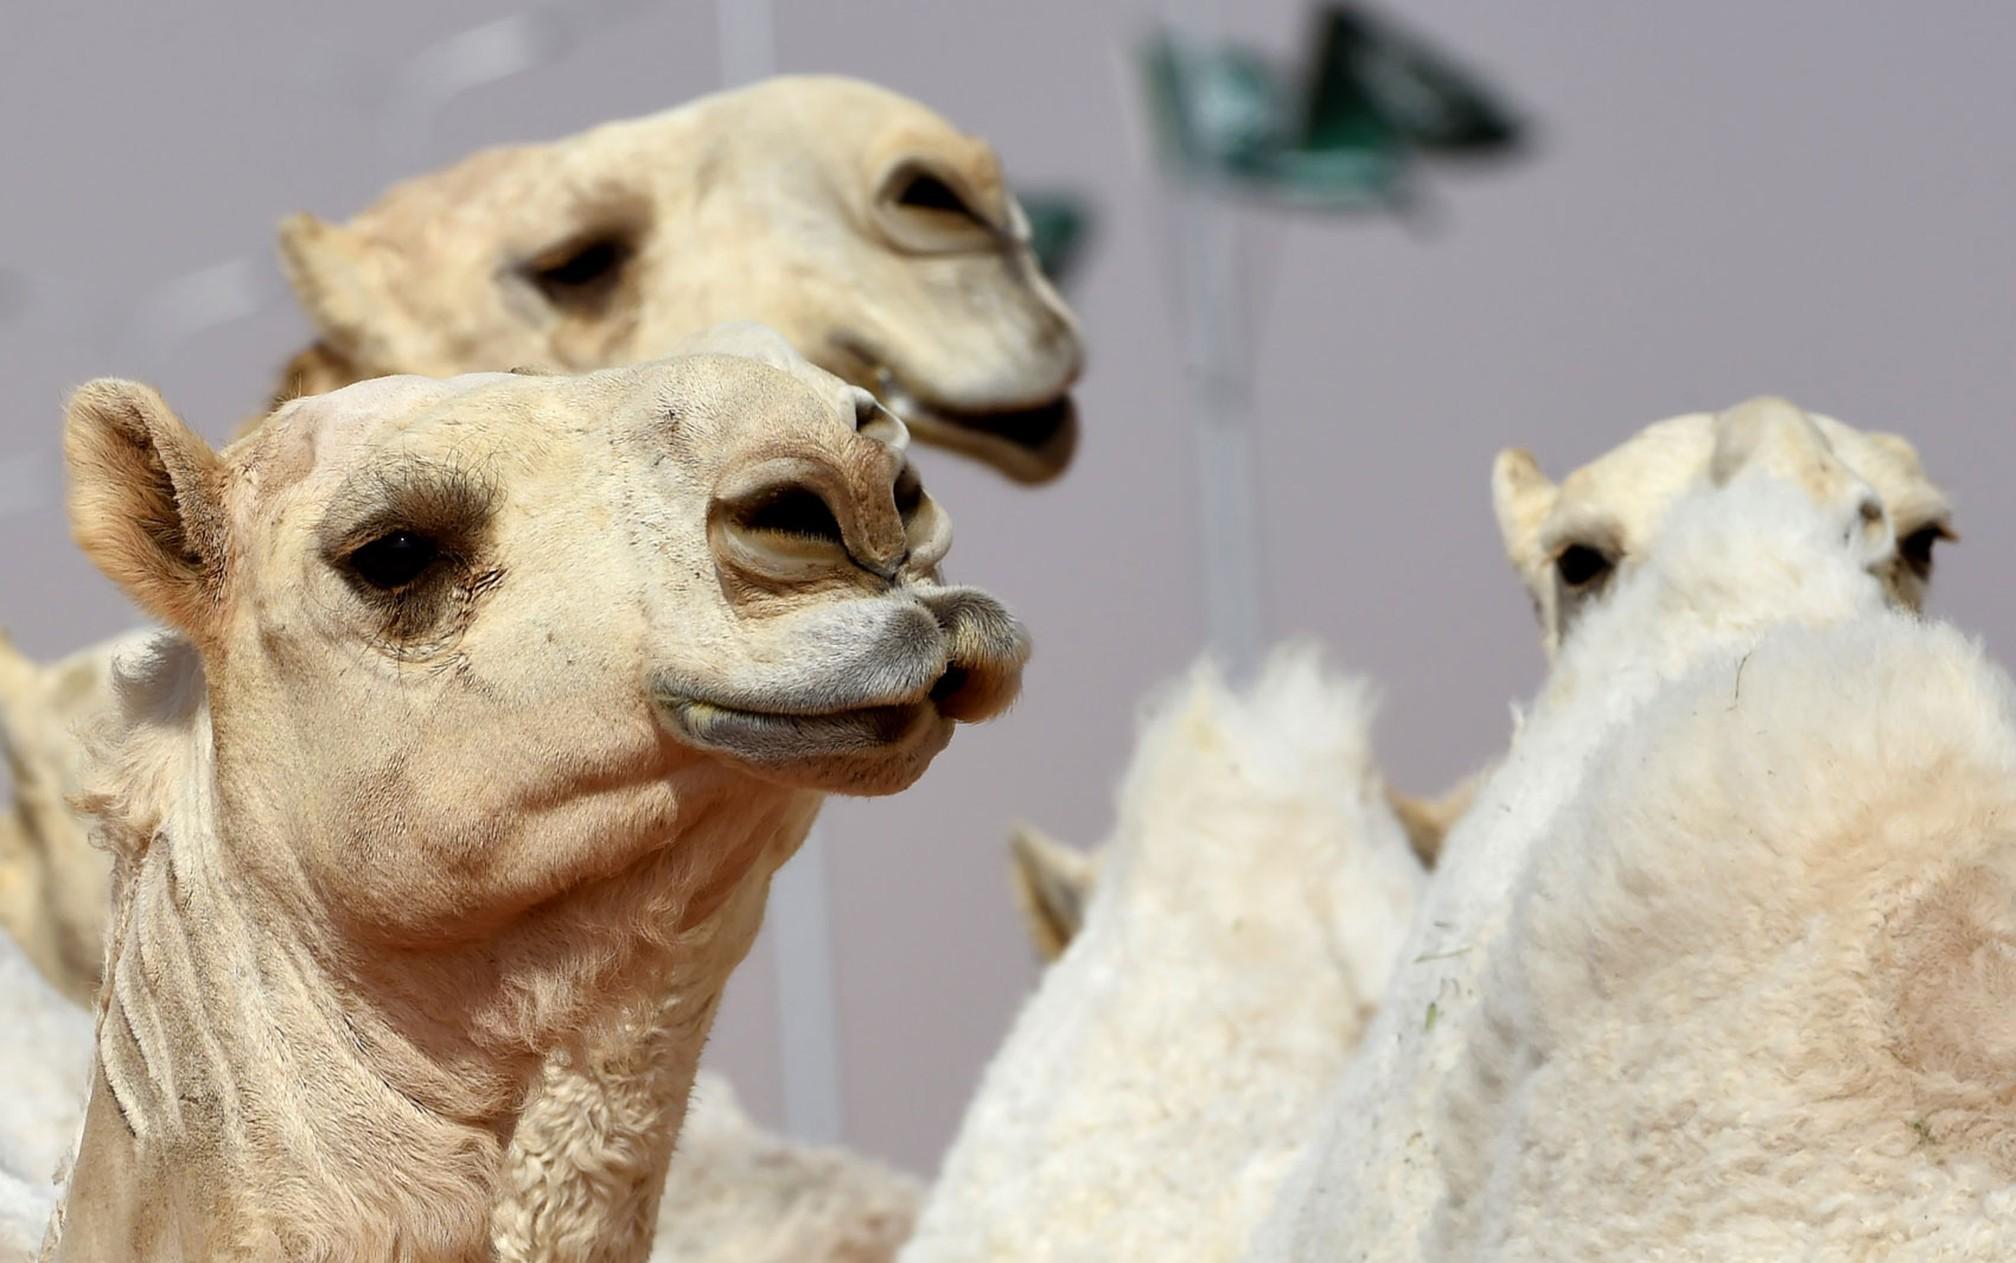 Austrália vai matar 10 mil camelos selvagens